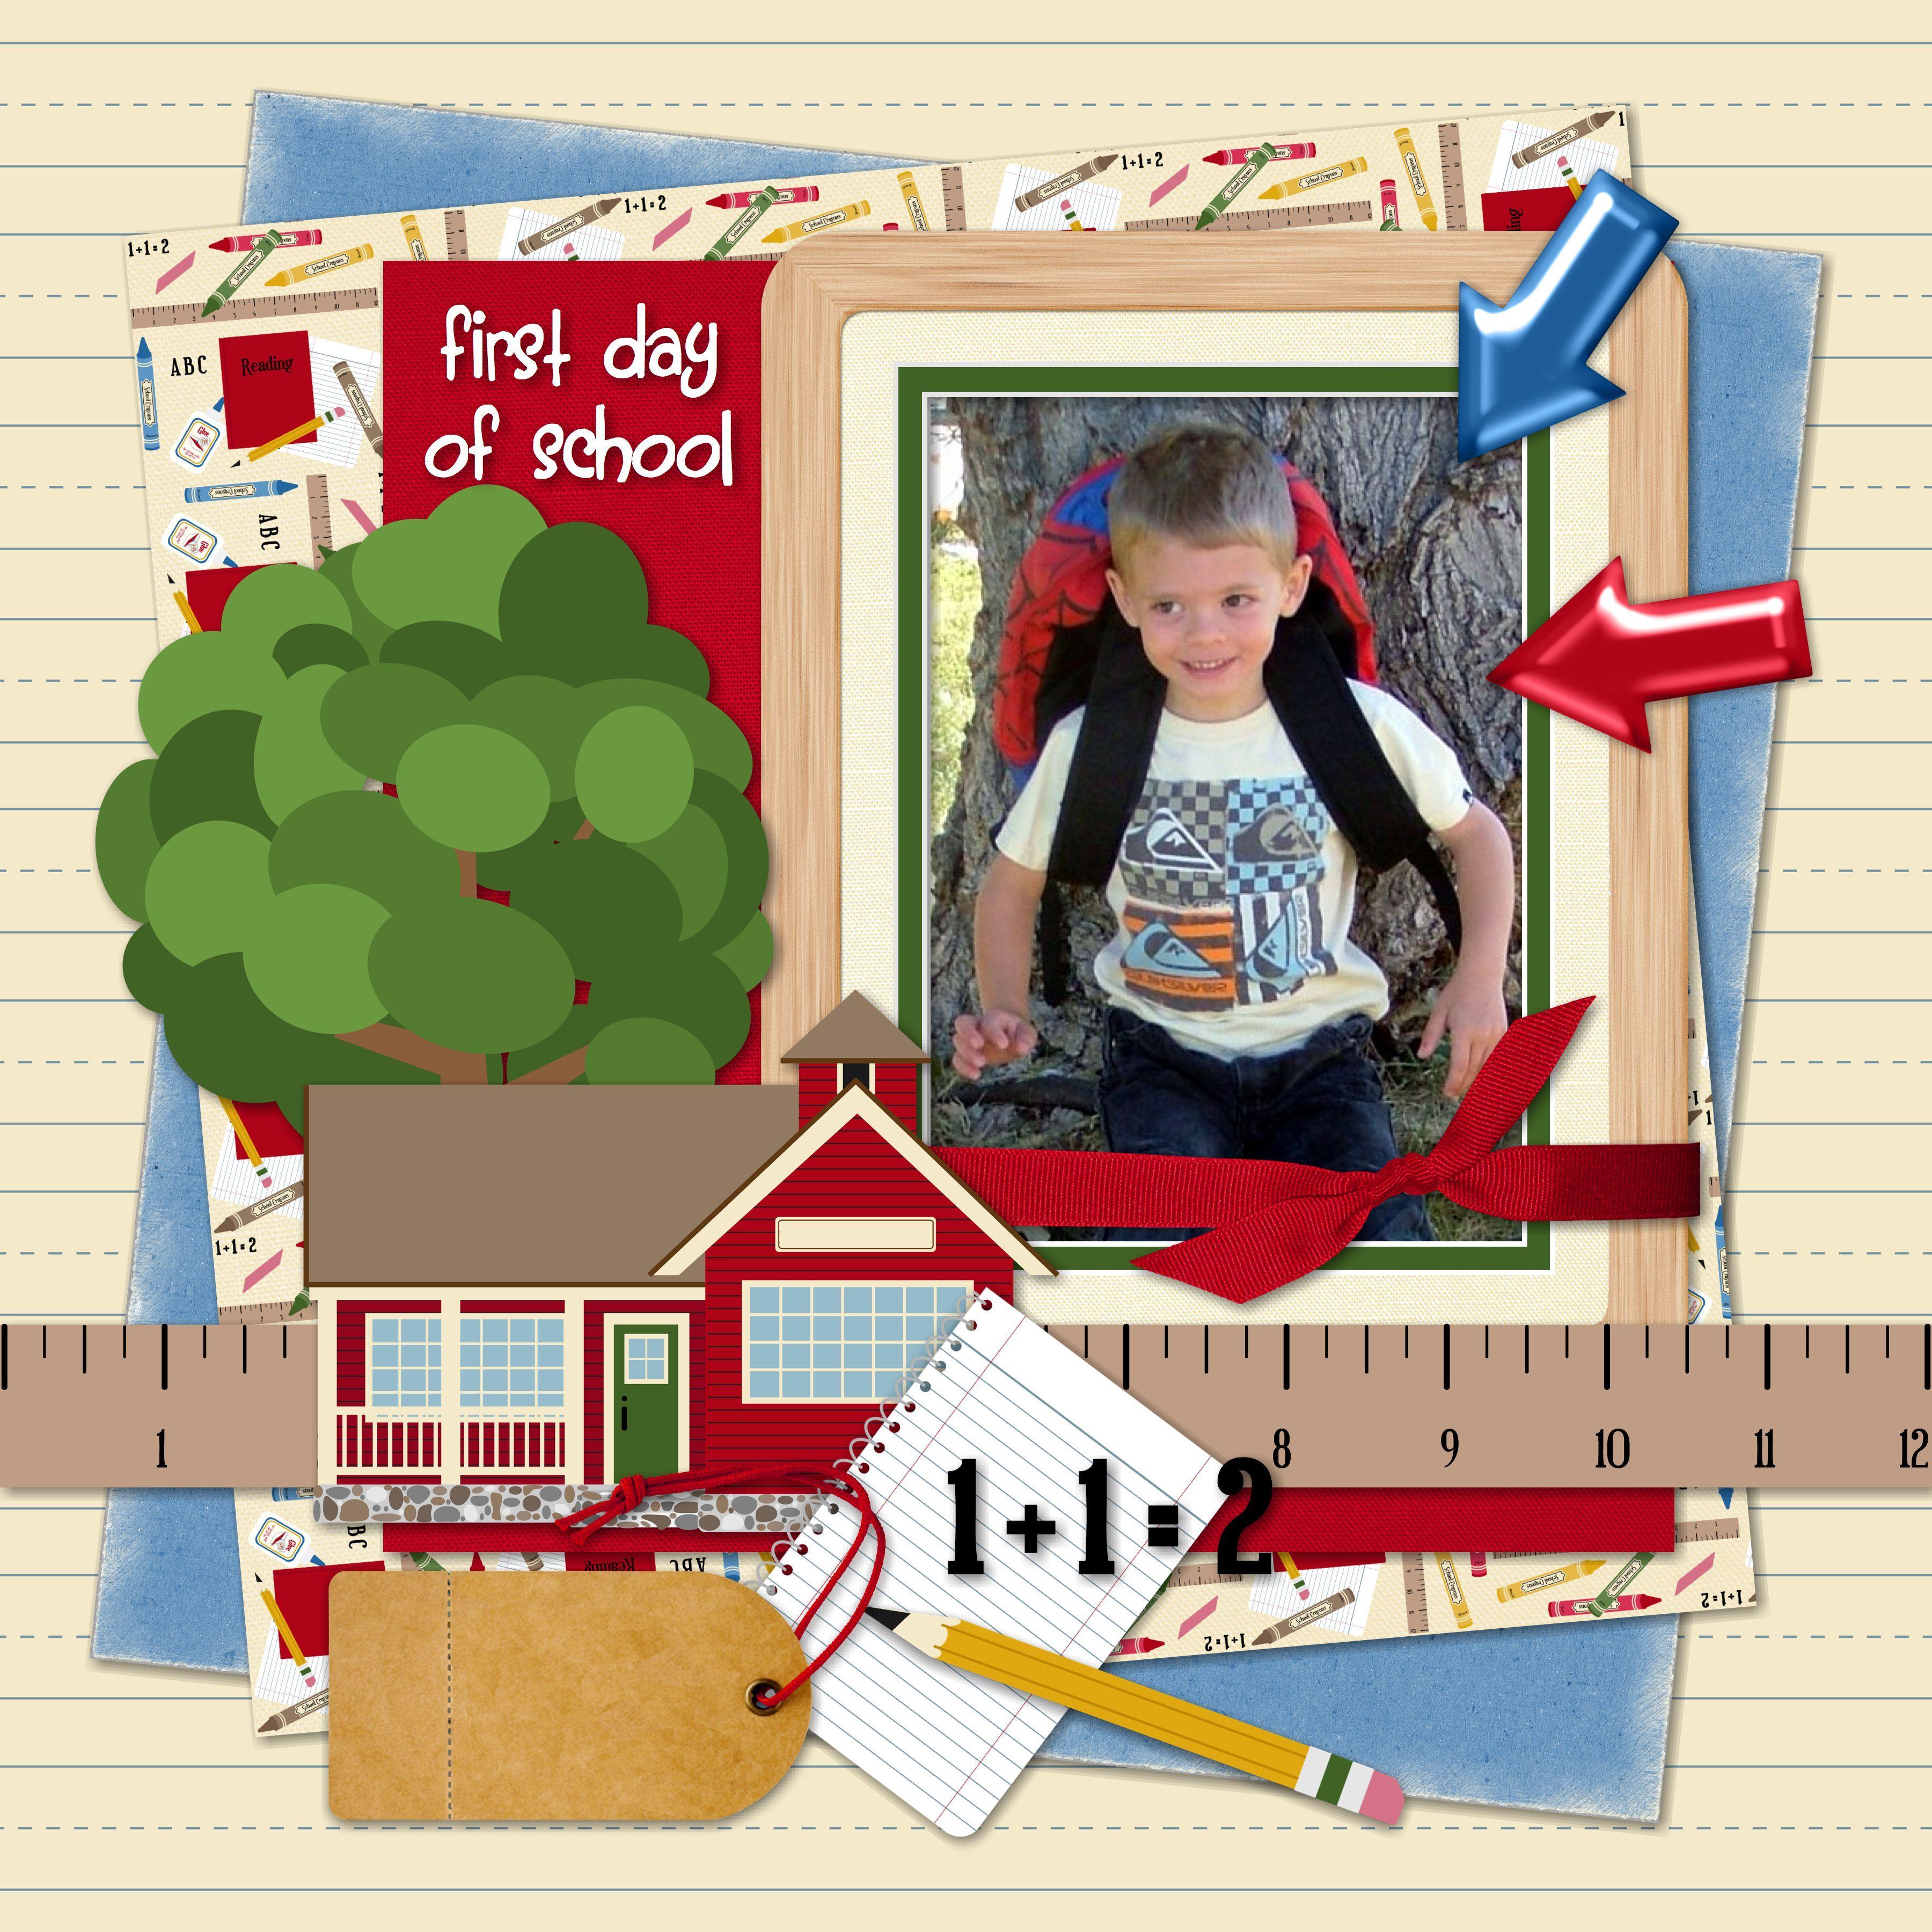 Scrapbook ideas kindergarten - Digital Scrapbooking My Grandson S First Day Of Kindergarten I Made This Page With My